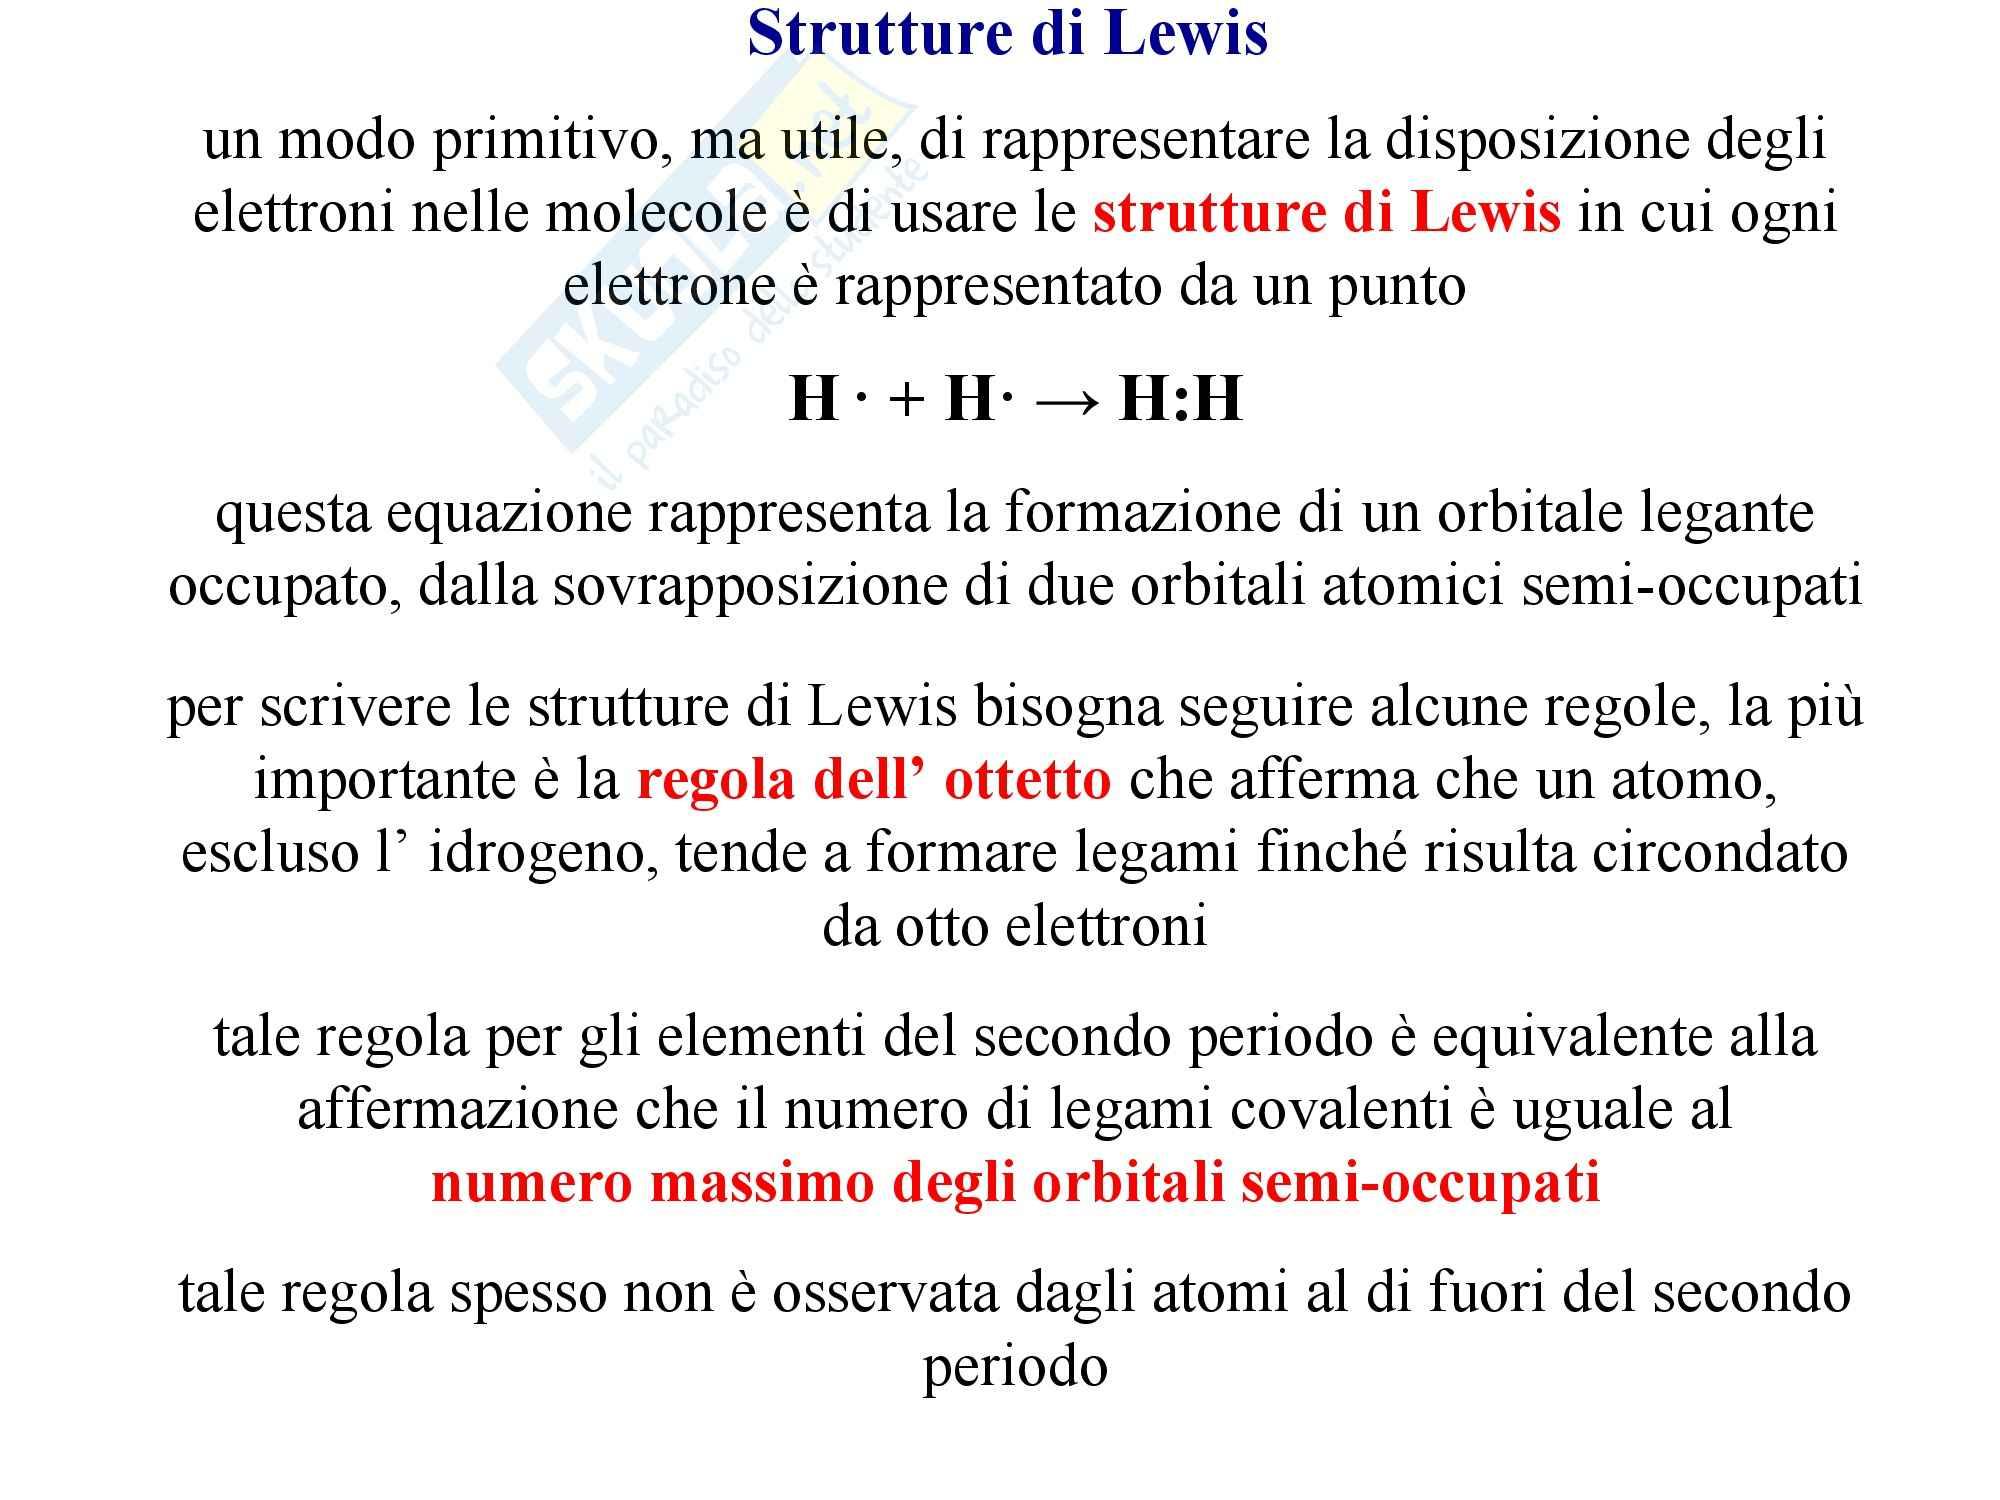 Strutture di Lewis, Chimica generale Pag. 2